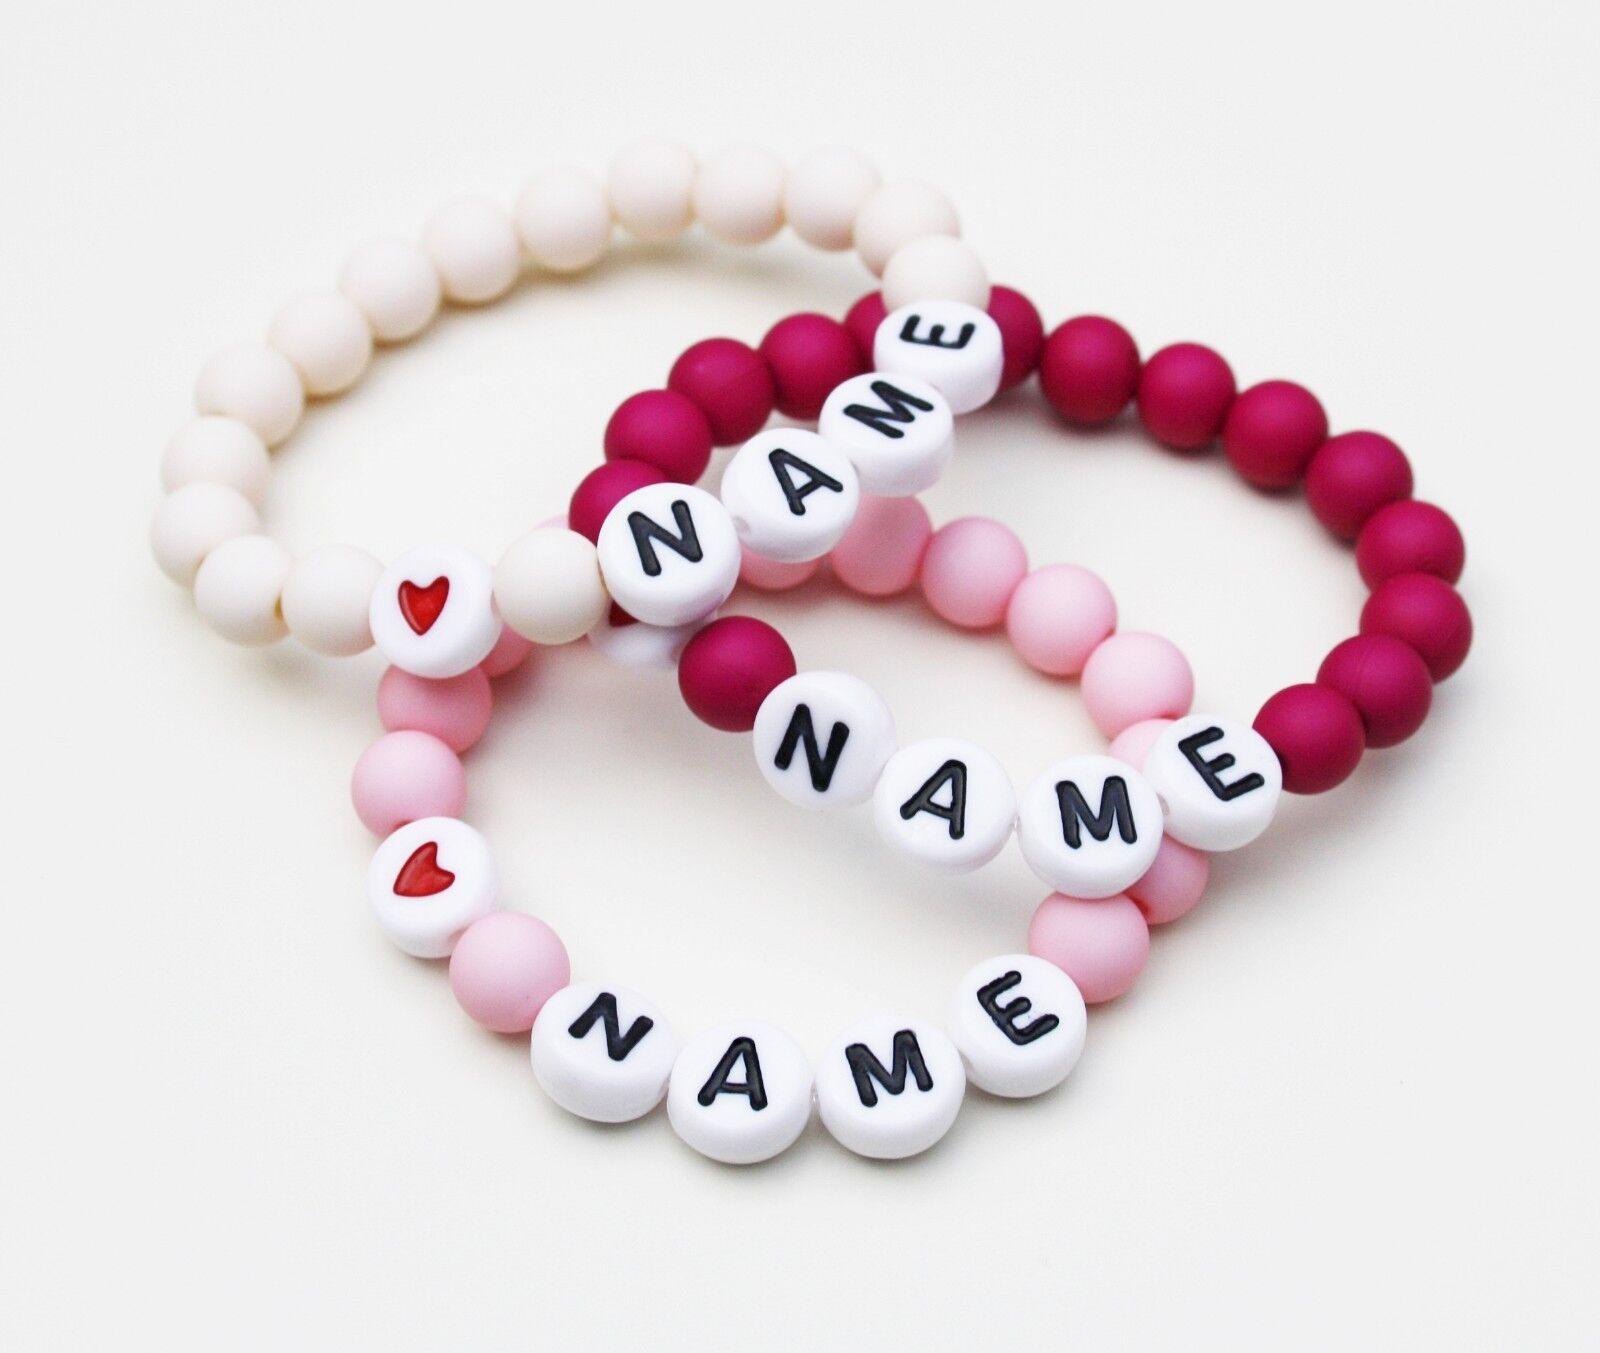 Baby Kinder Armband mit Name Personalisiert Namens Armband Taufe Geburt Geschenk